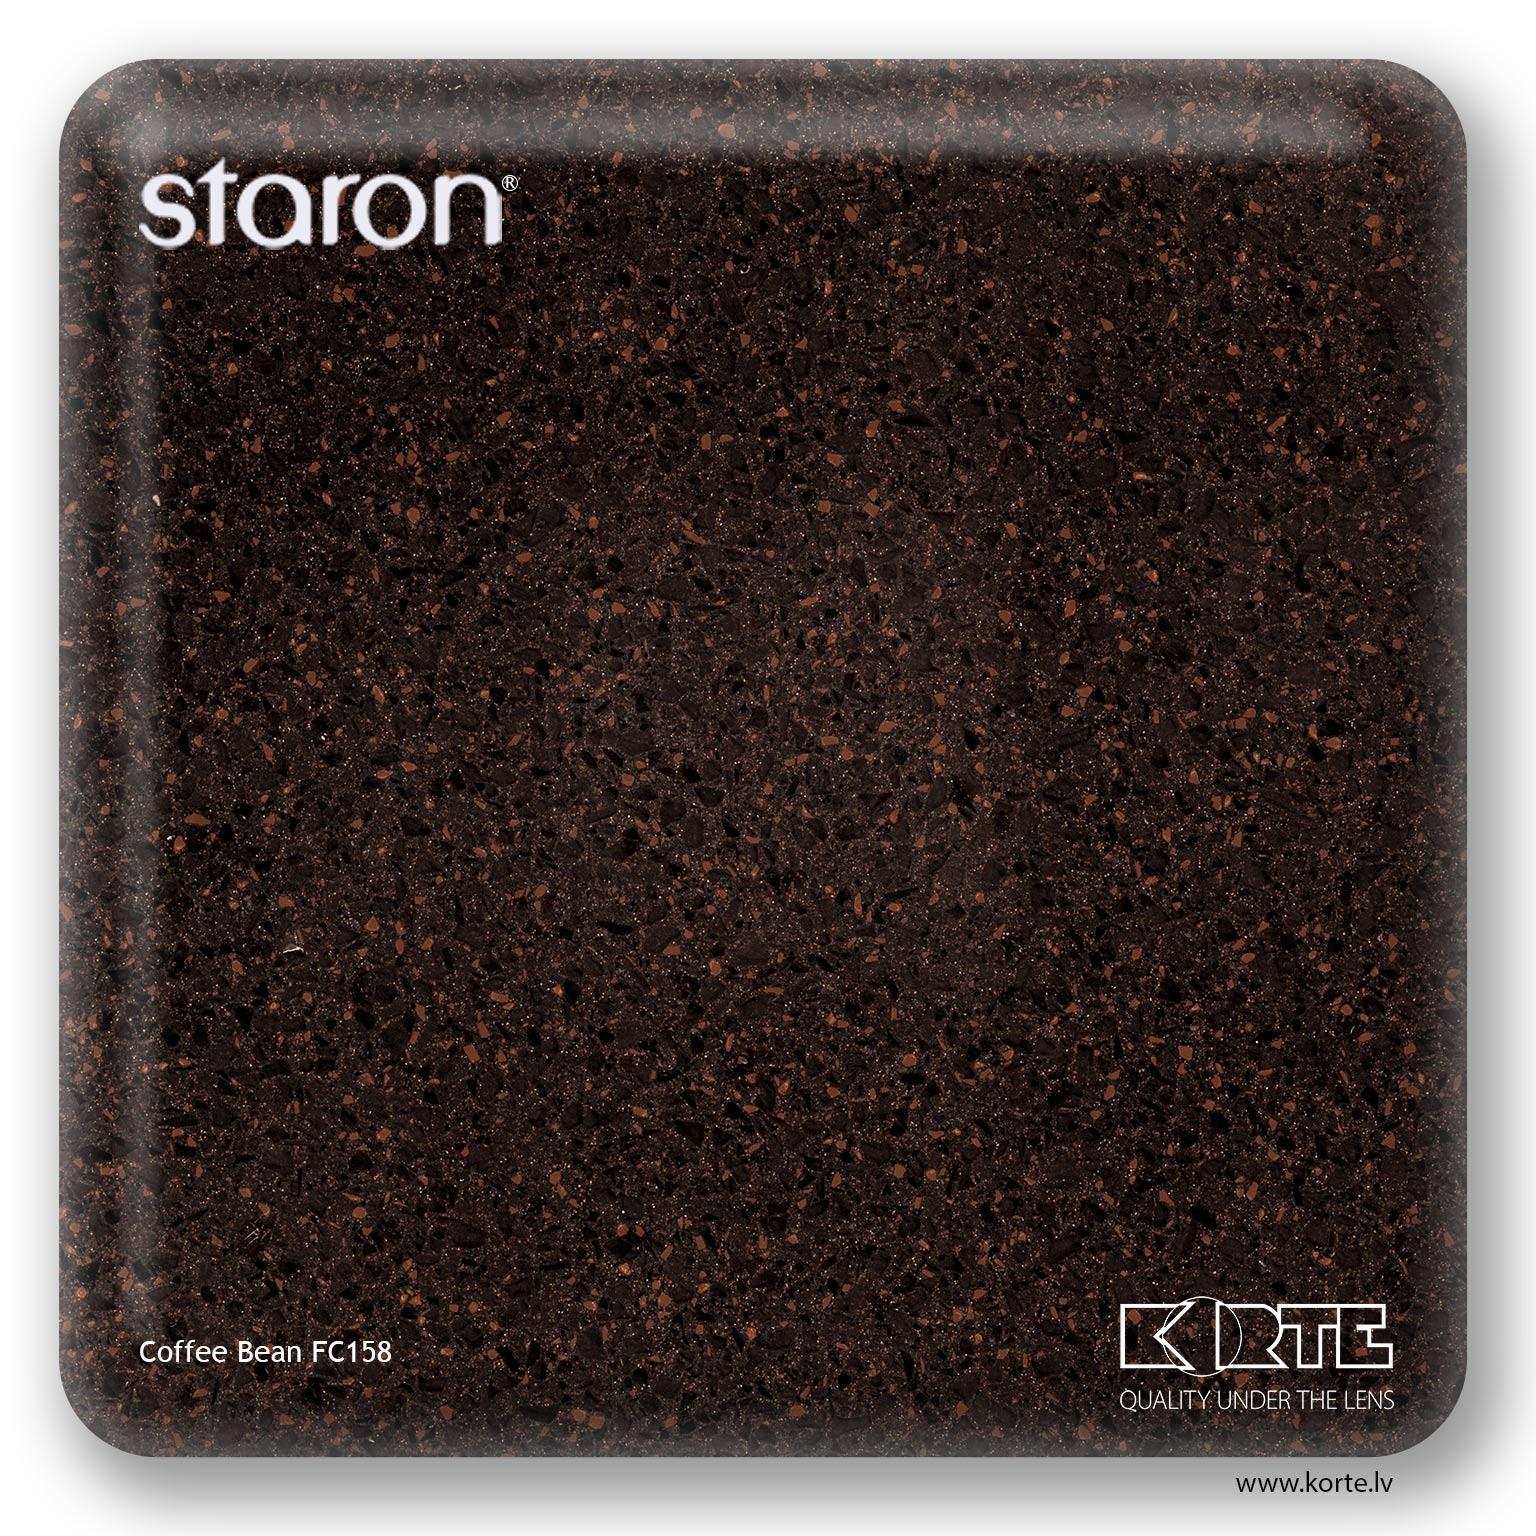 Staron Coffee Bean FC158